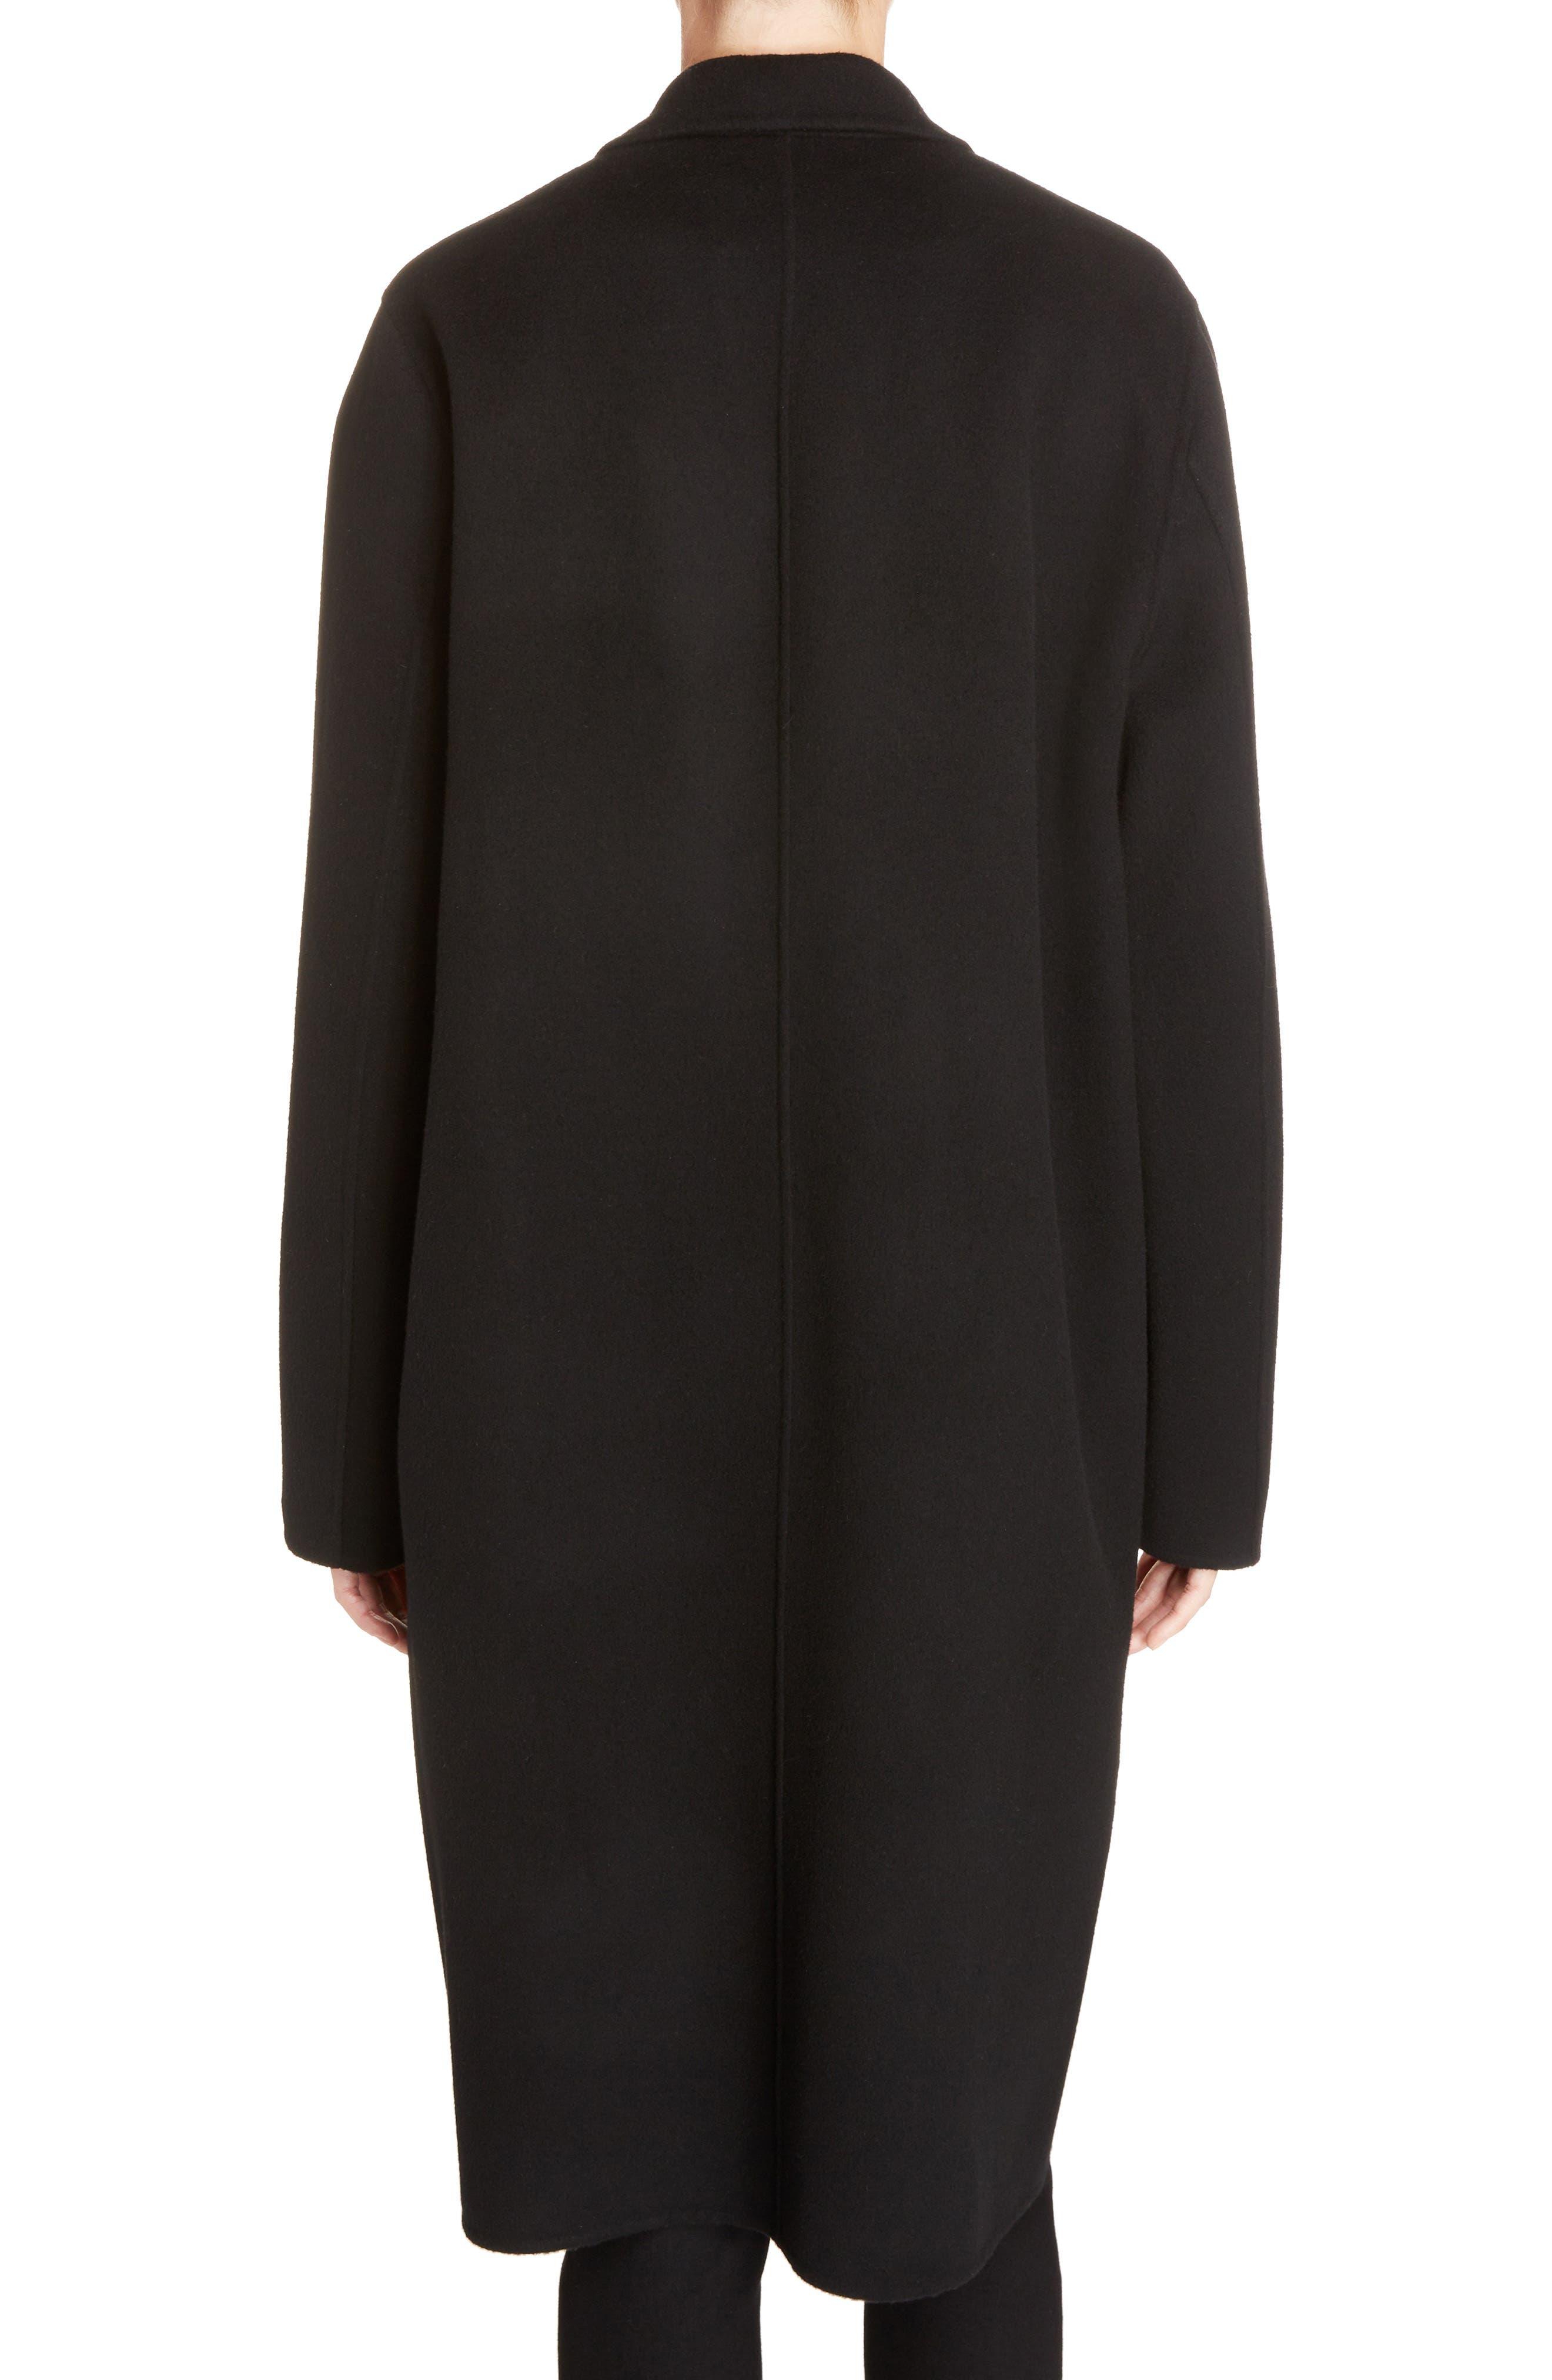 Avalon Wool & Cashmere Coat,                             Alternate thumbnail 2, color,                             Black